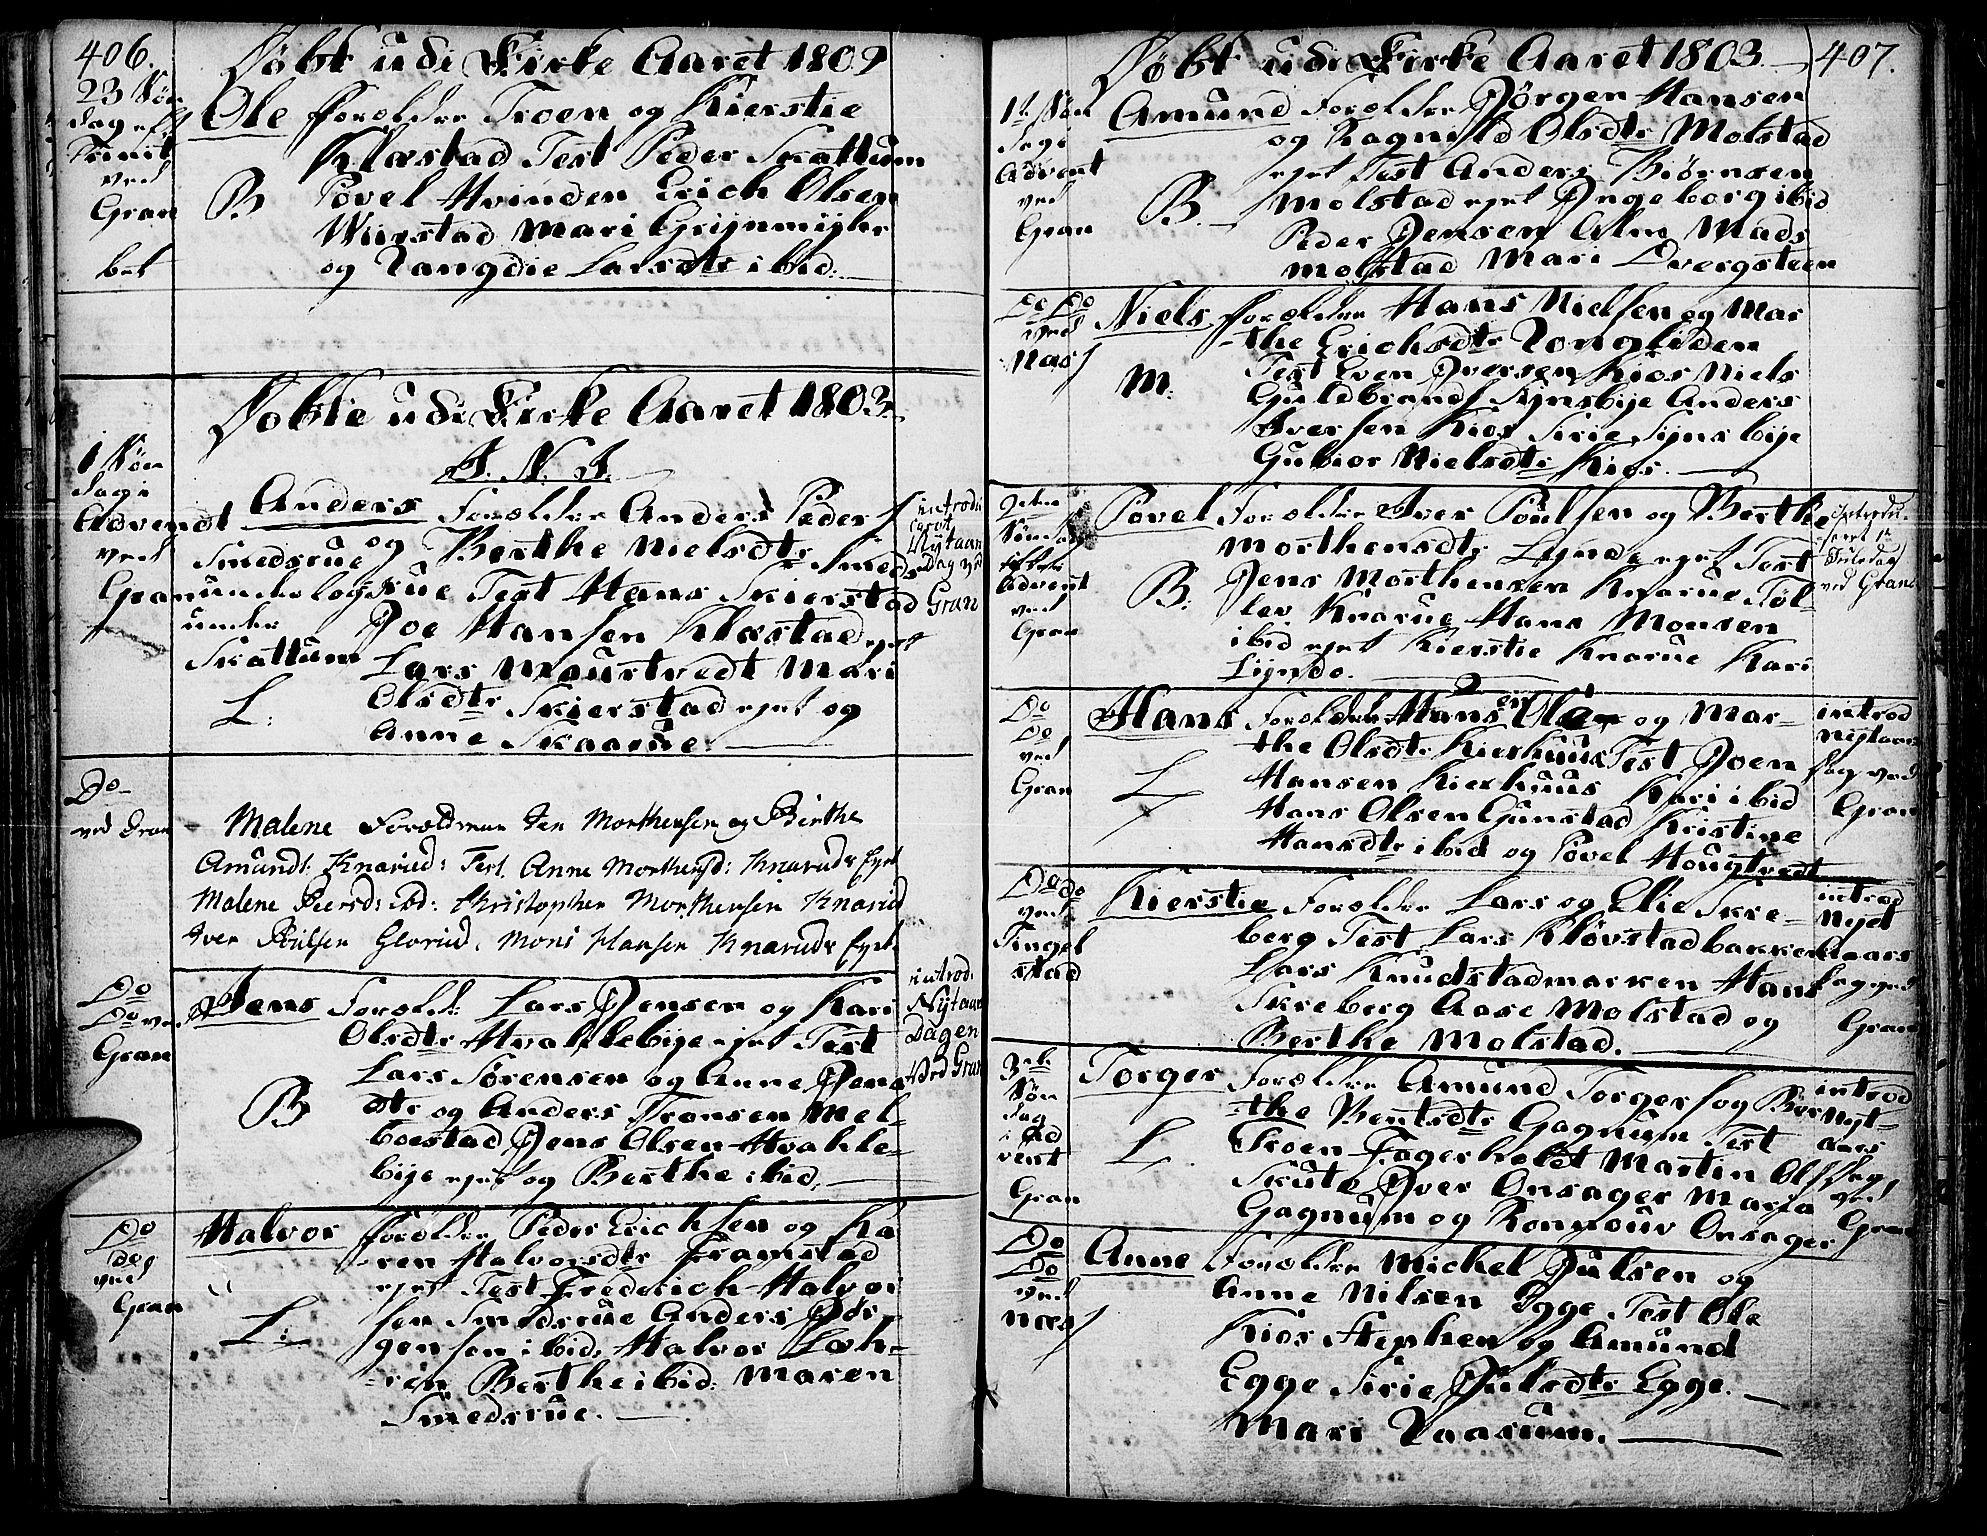 SAH, Gran prestekontor, Ministerialbok nr. 6, 1787-1824, s. 406-407